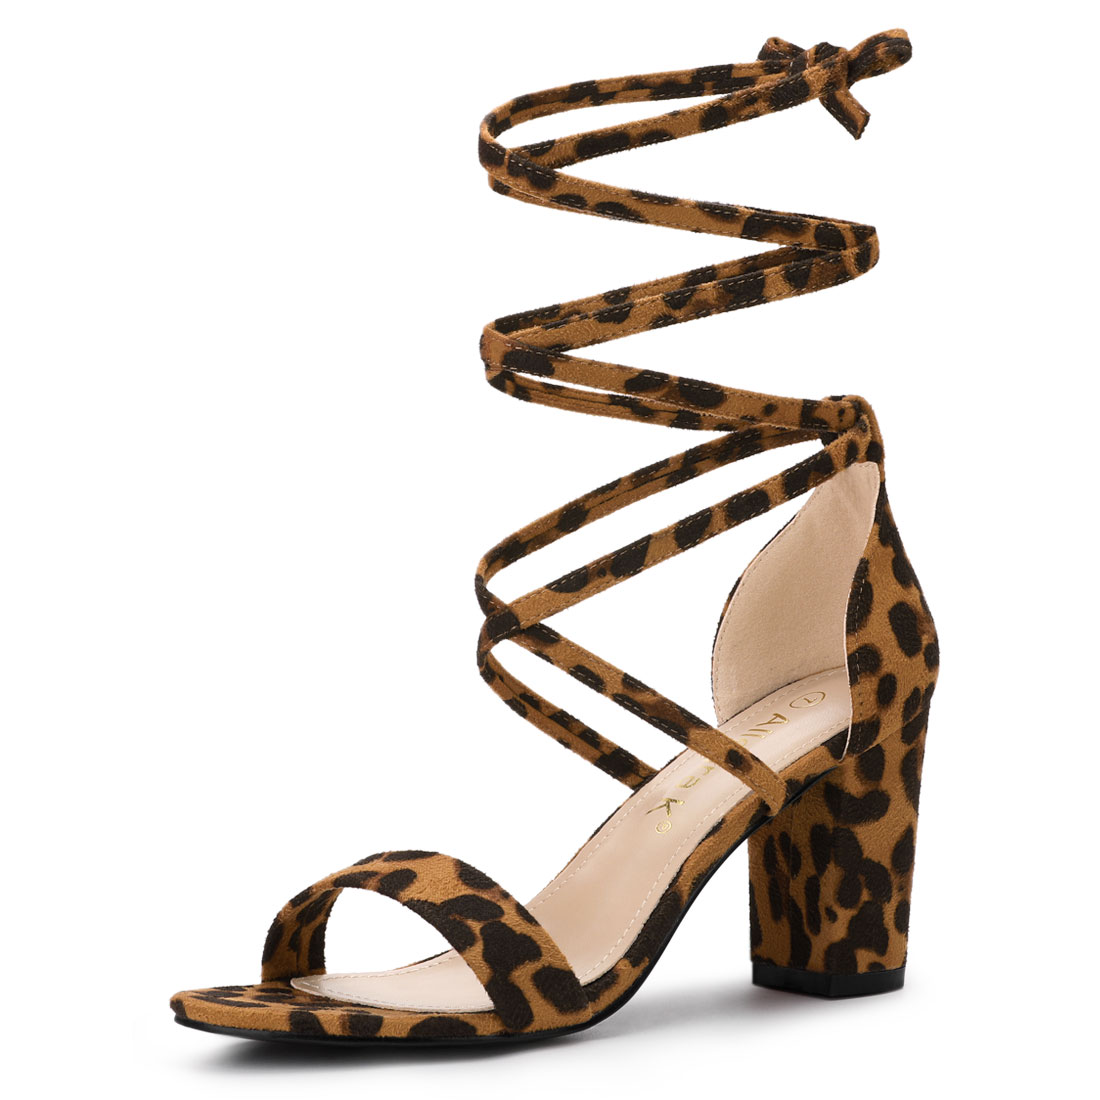 Allegra K Women's One Strap Block Heel Lace Up Sandals Leopard US 9.5